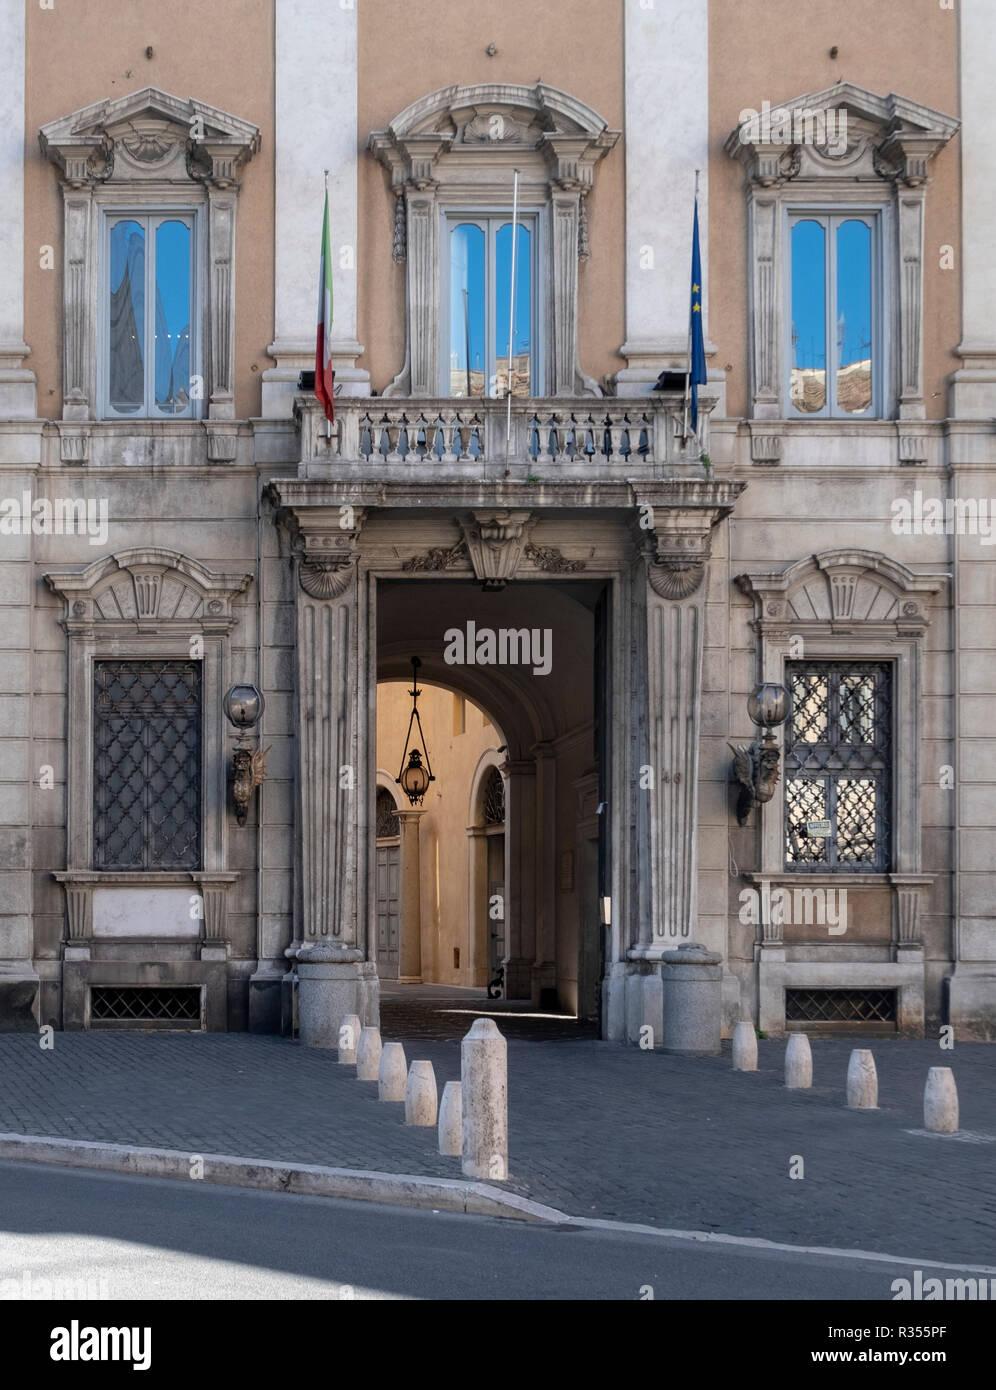 Rom, Roma, Stadtpalais an der Piazza del Gesu - Stock Image